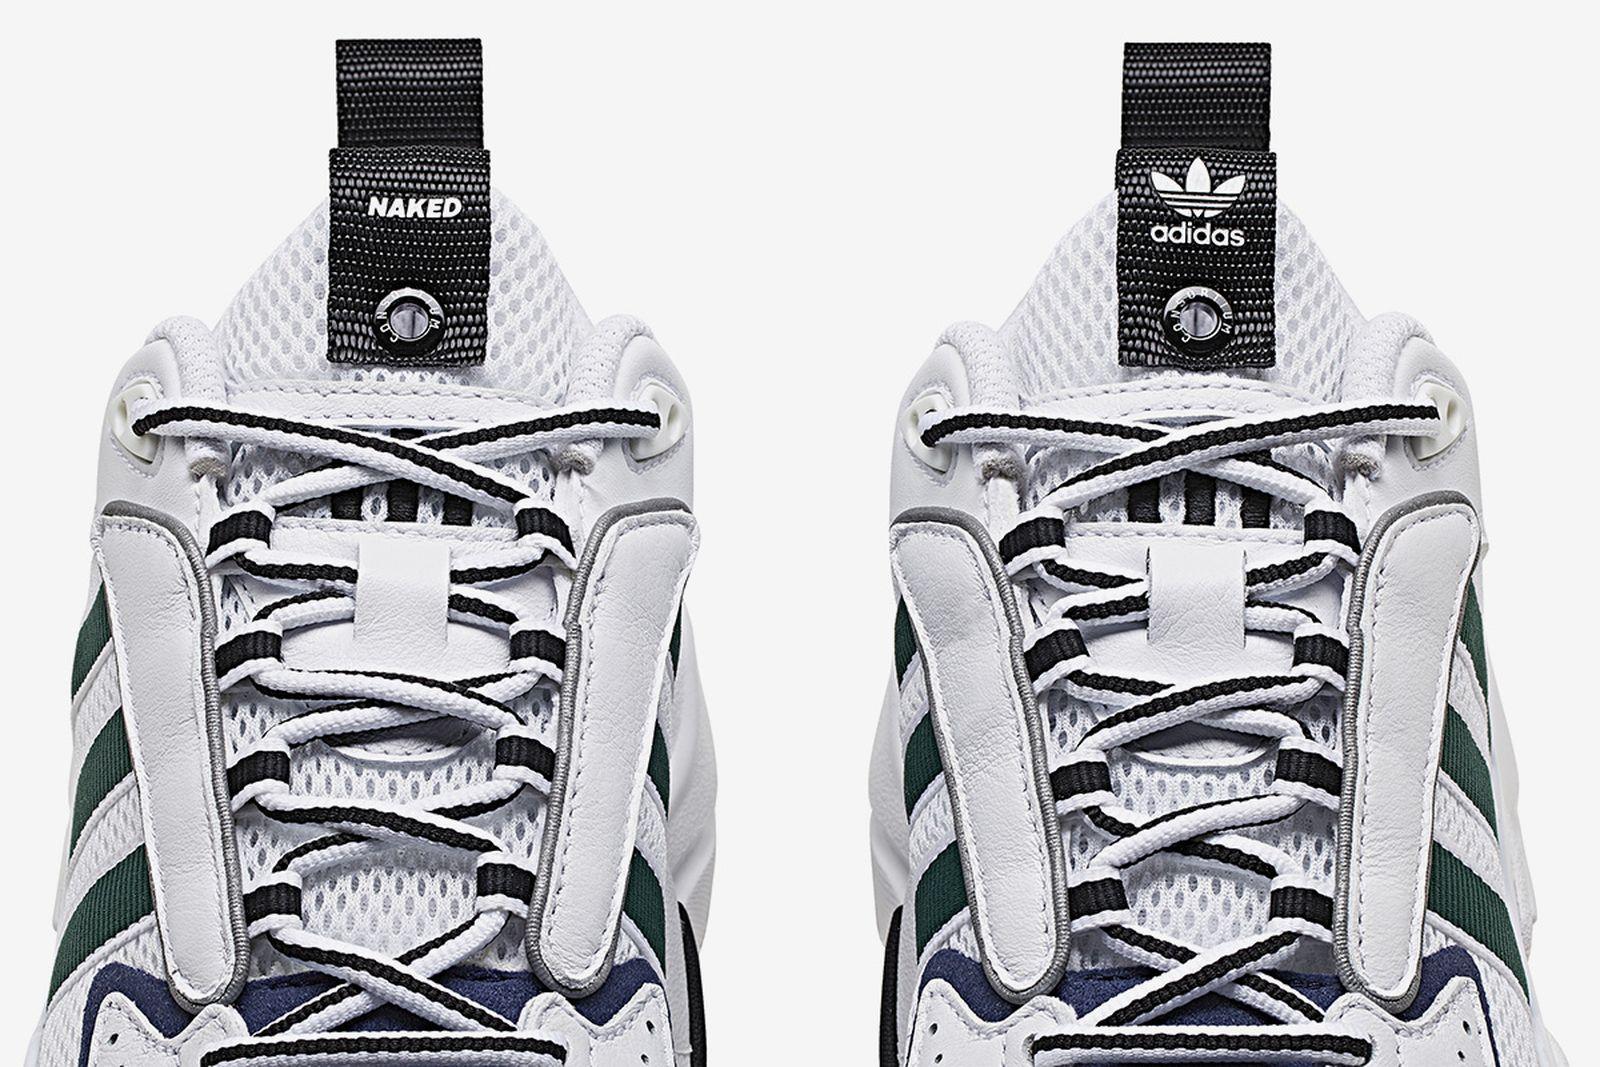 naked adidas magmur runner release date price 0 adidas consortium